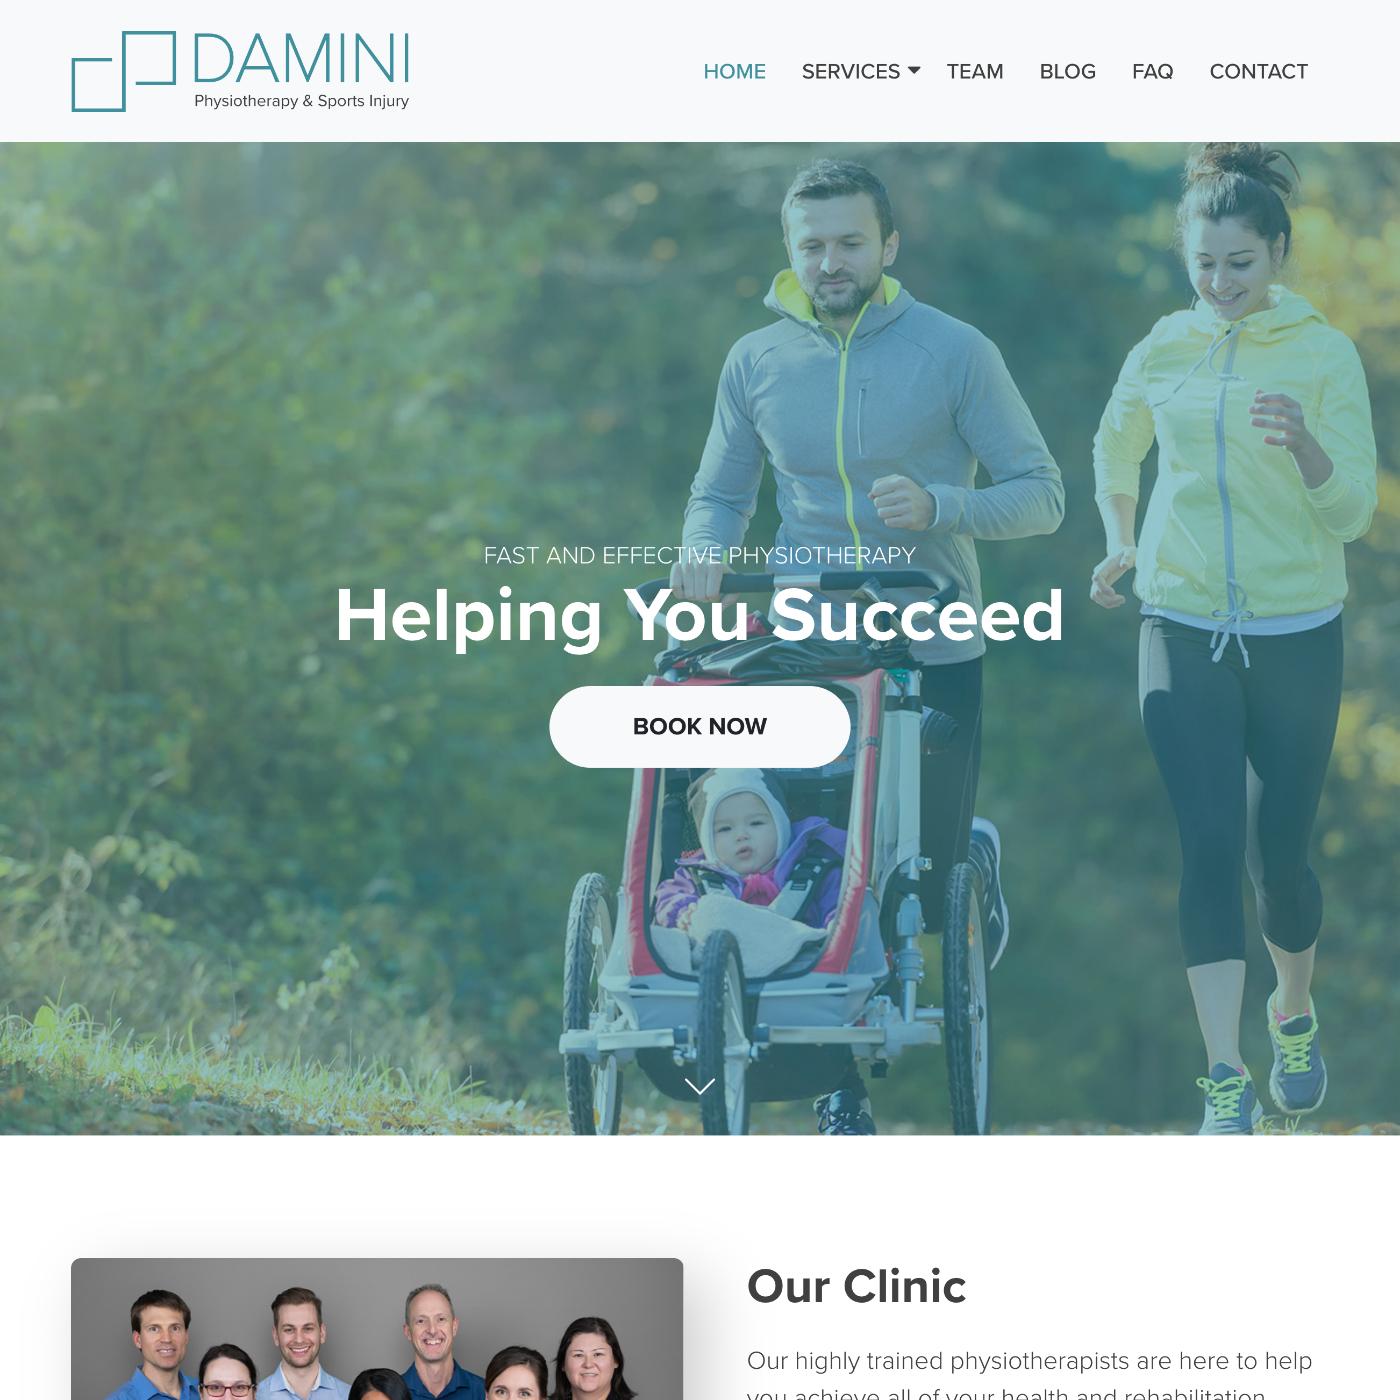 Damini - layout.png